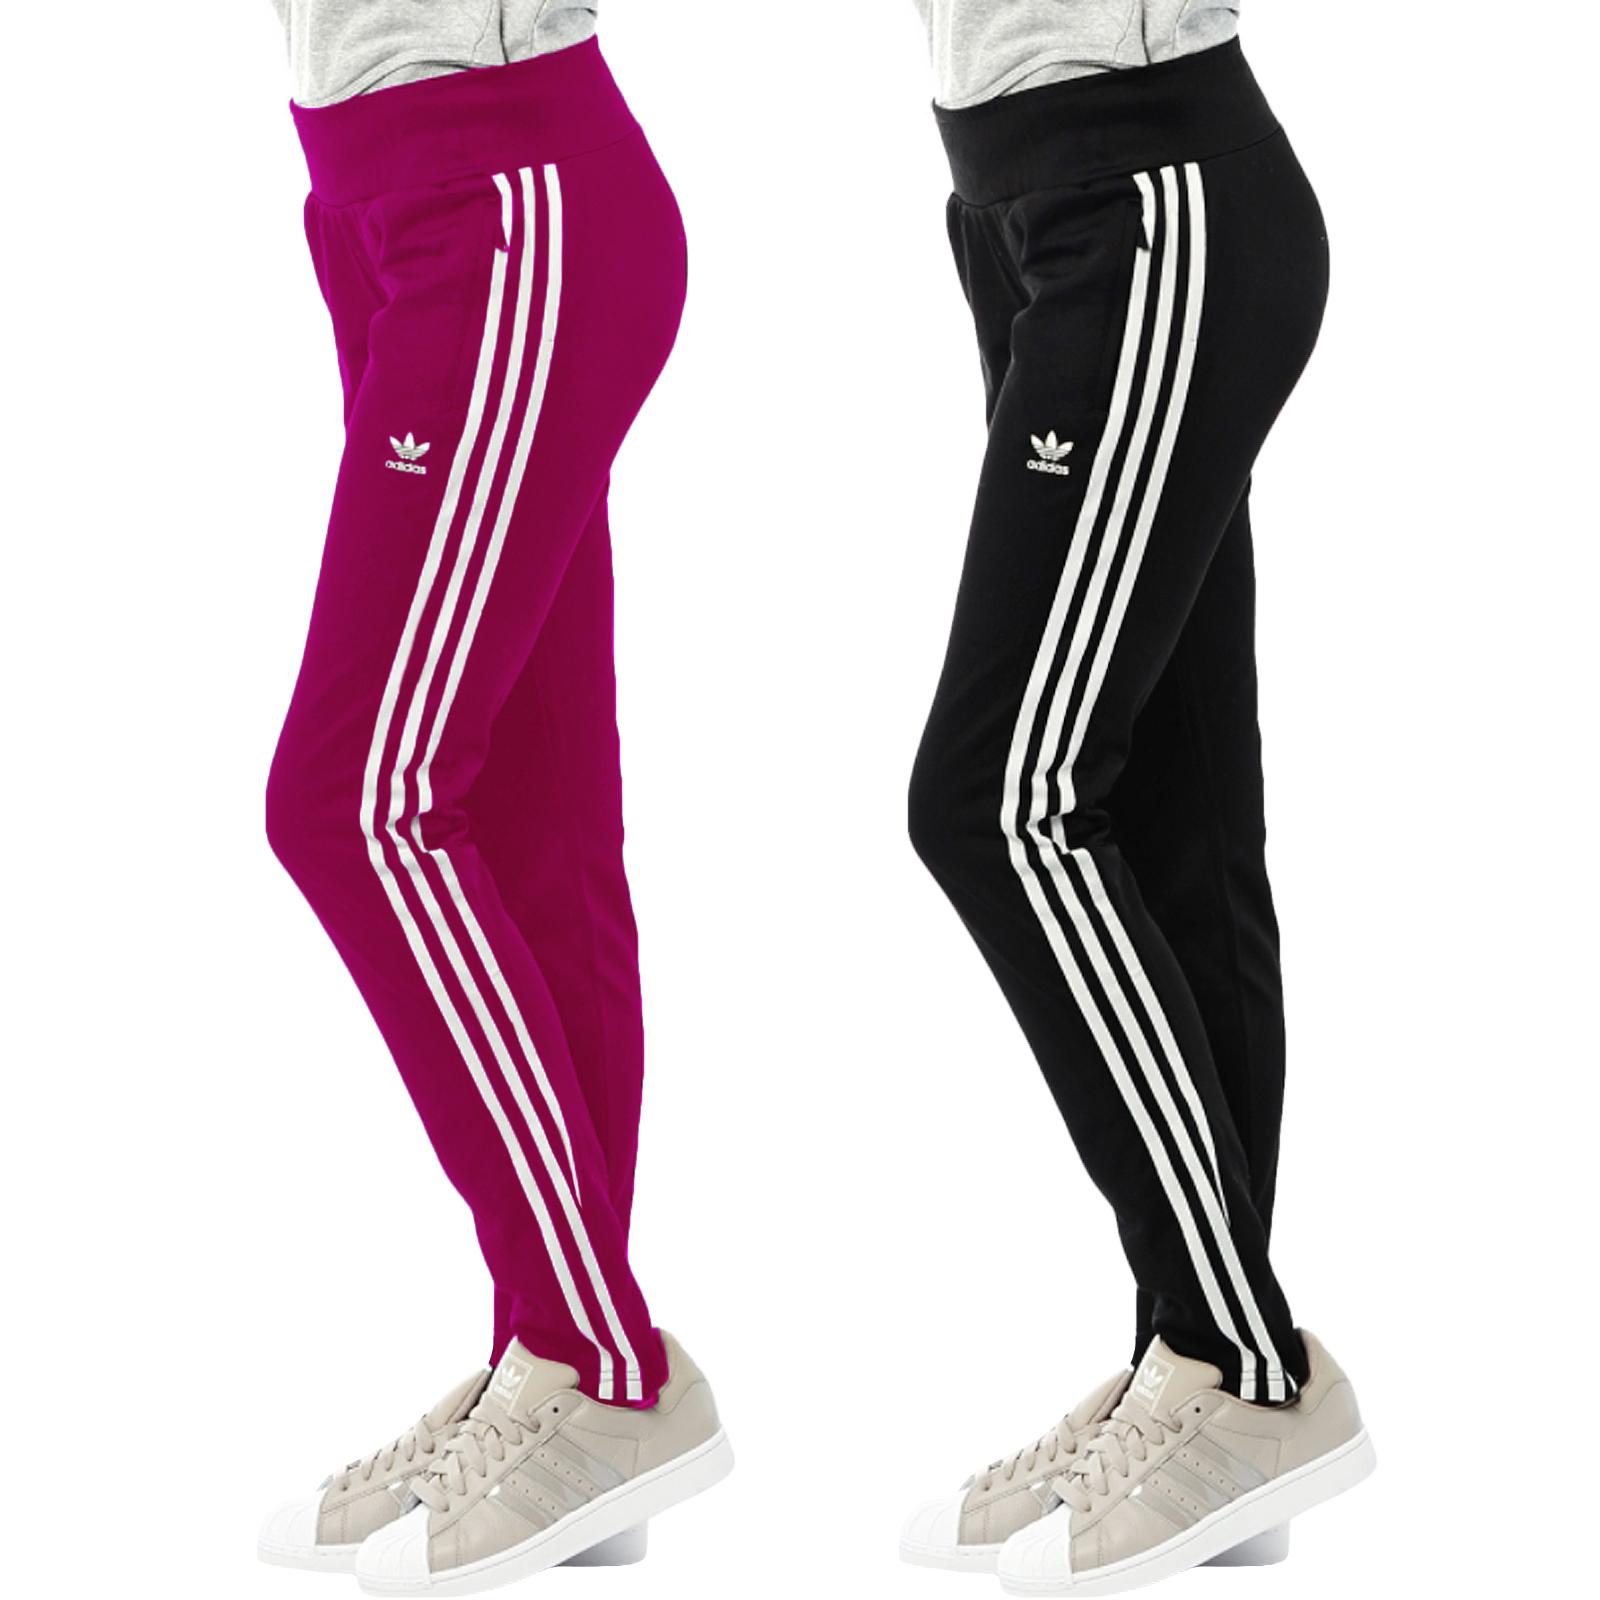 adidas original damen europa sportanzug jogginghose b den b ware ebay. Black Bedroom Furniture Sets. Home Design Ideas